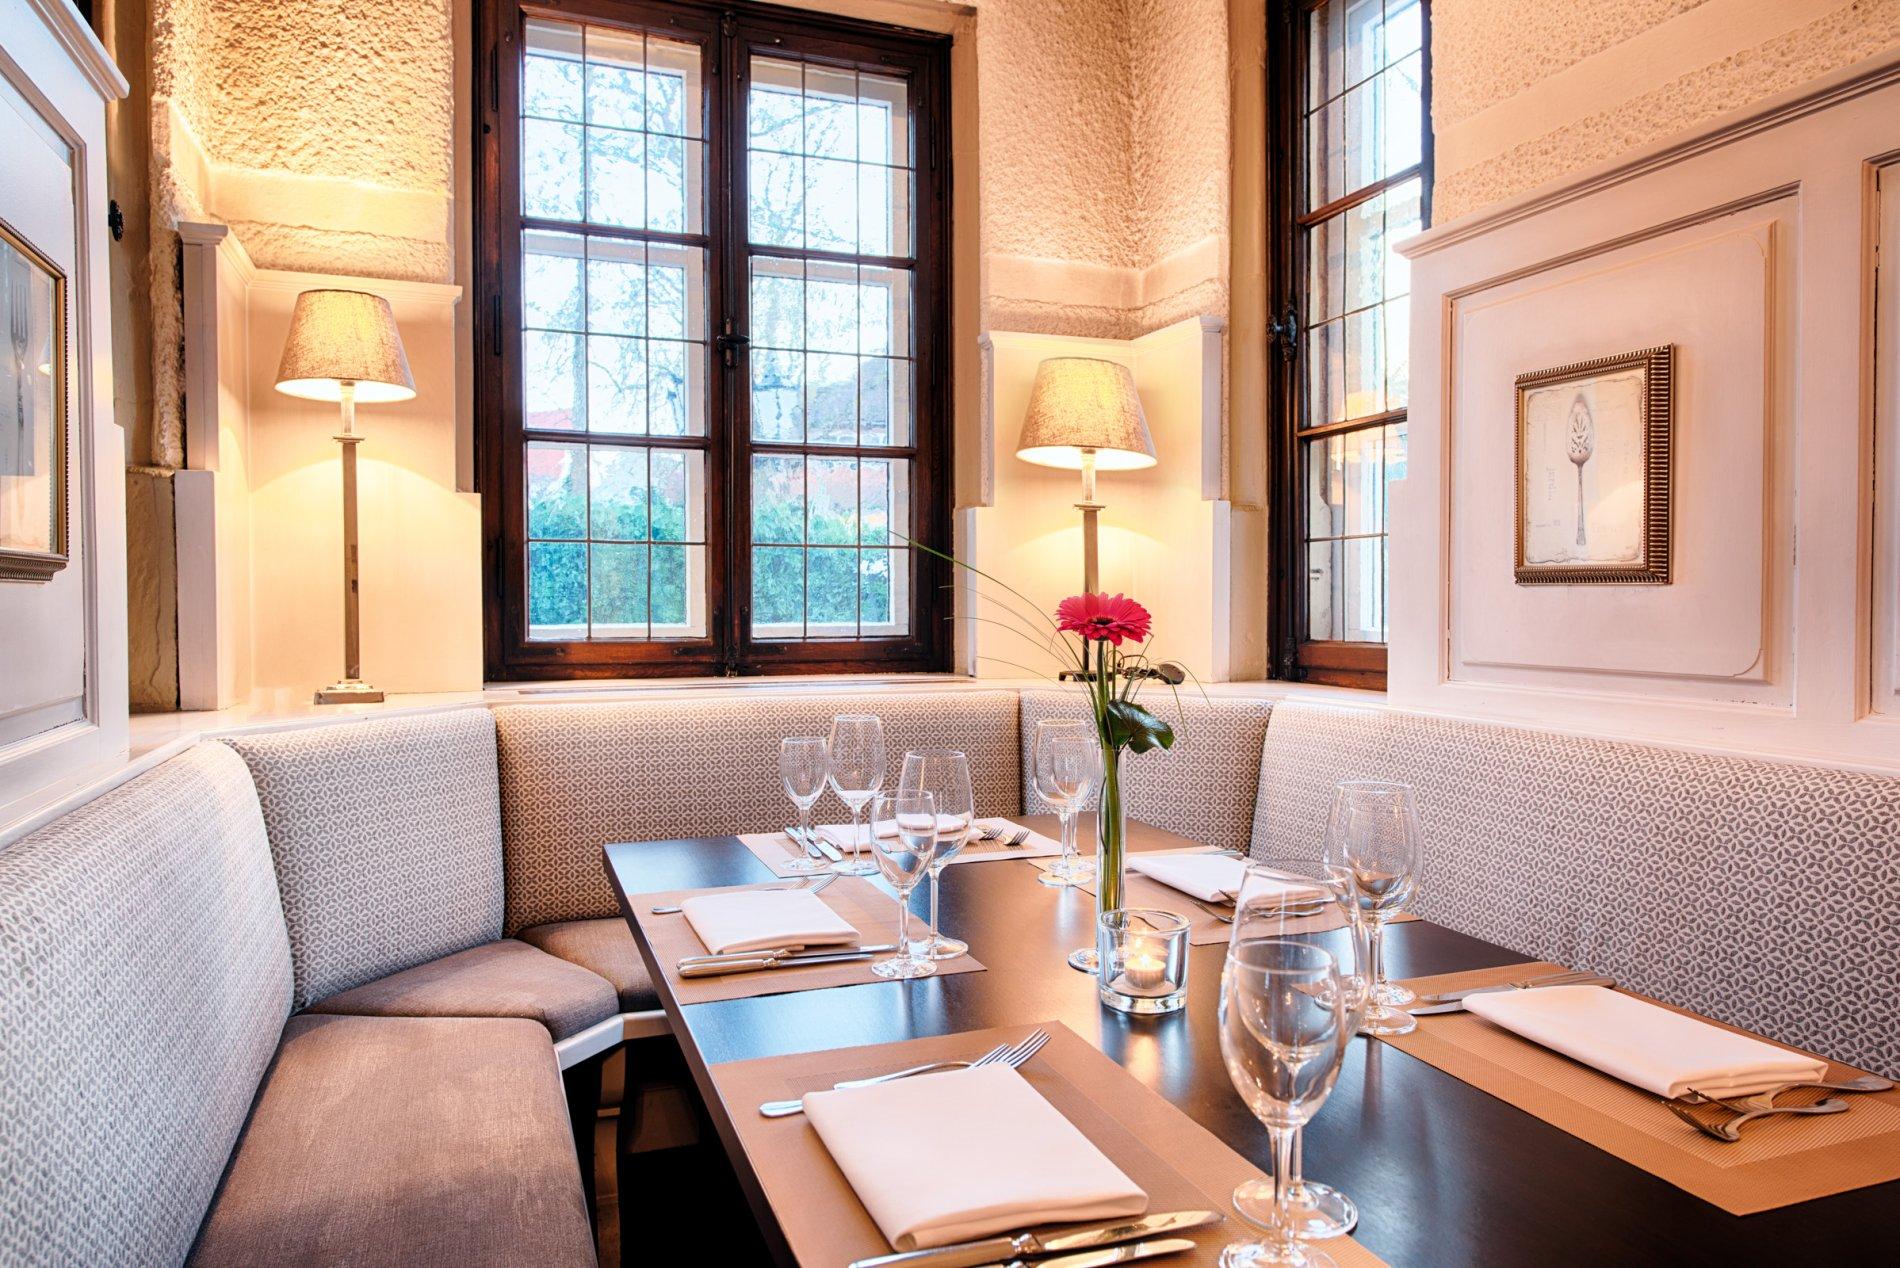 Restaurant Kamin   Hotelrestaurant Schloss Lehen   HeilbronnerLand